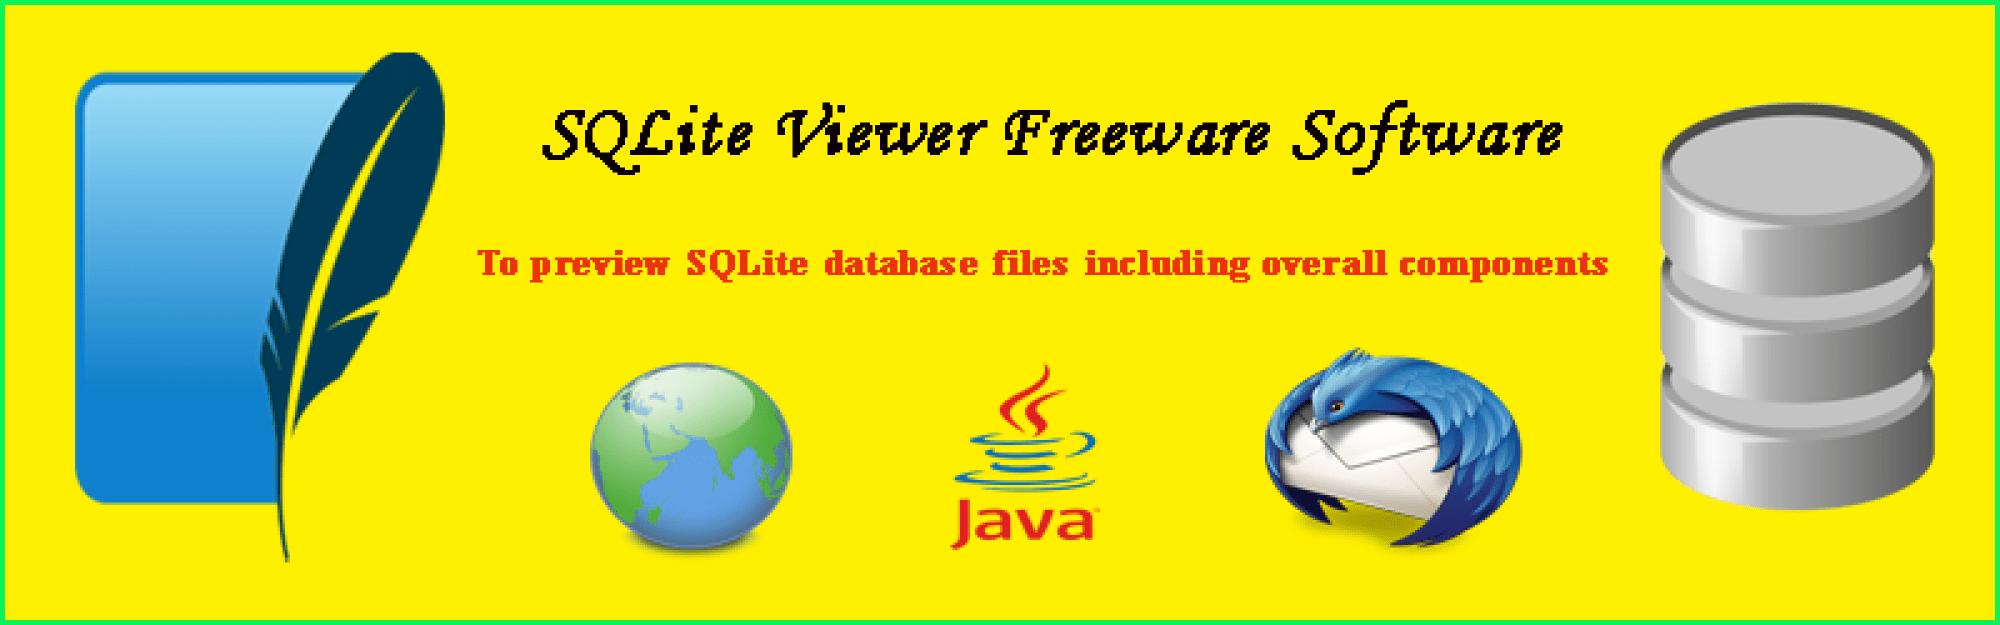 SQLite Viewer Mac Provides Possibility to View SQLite